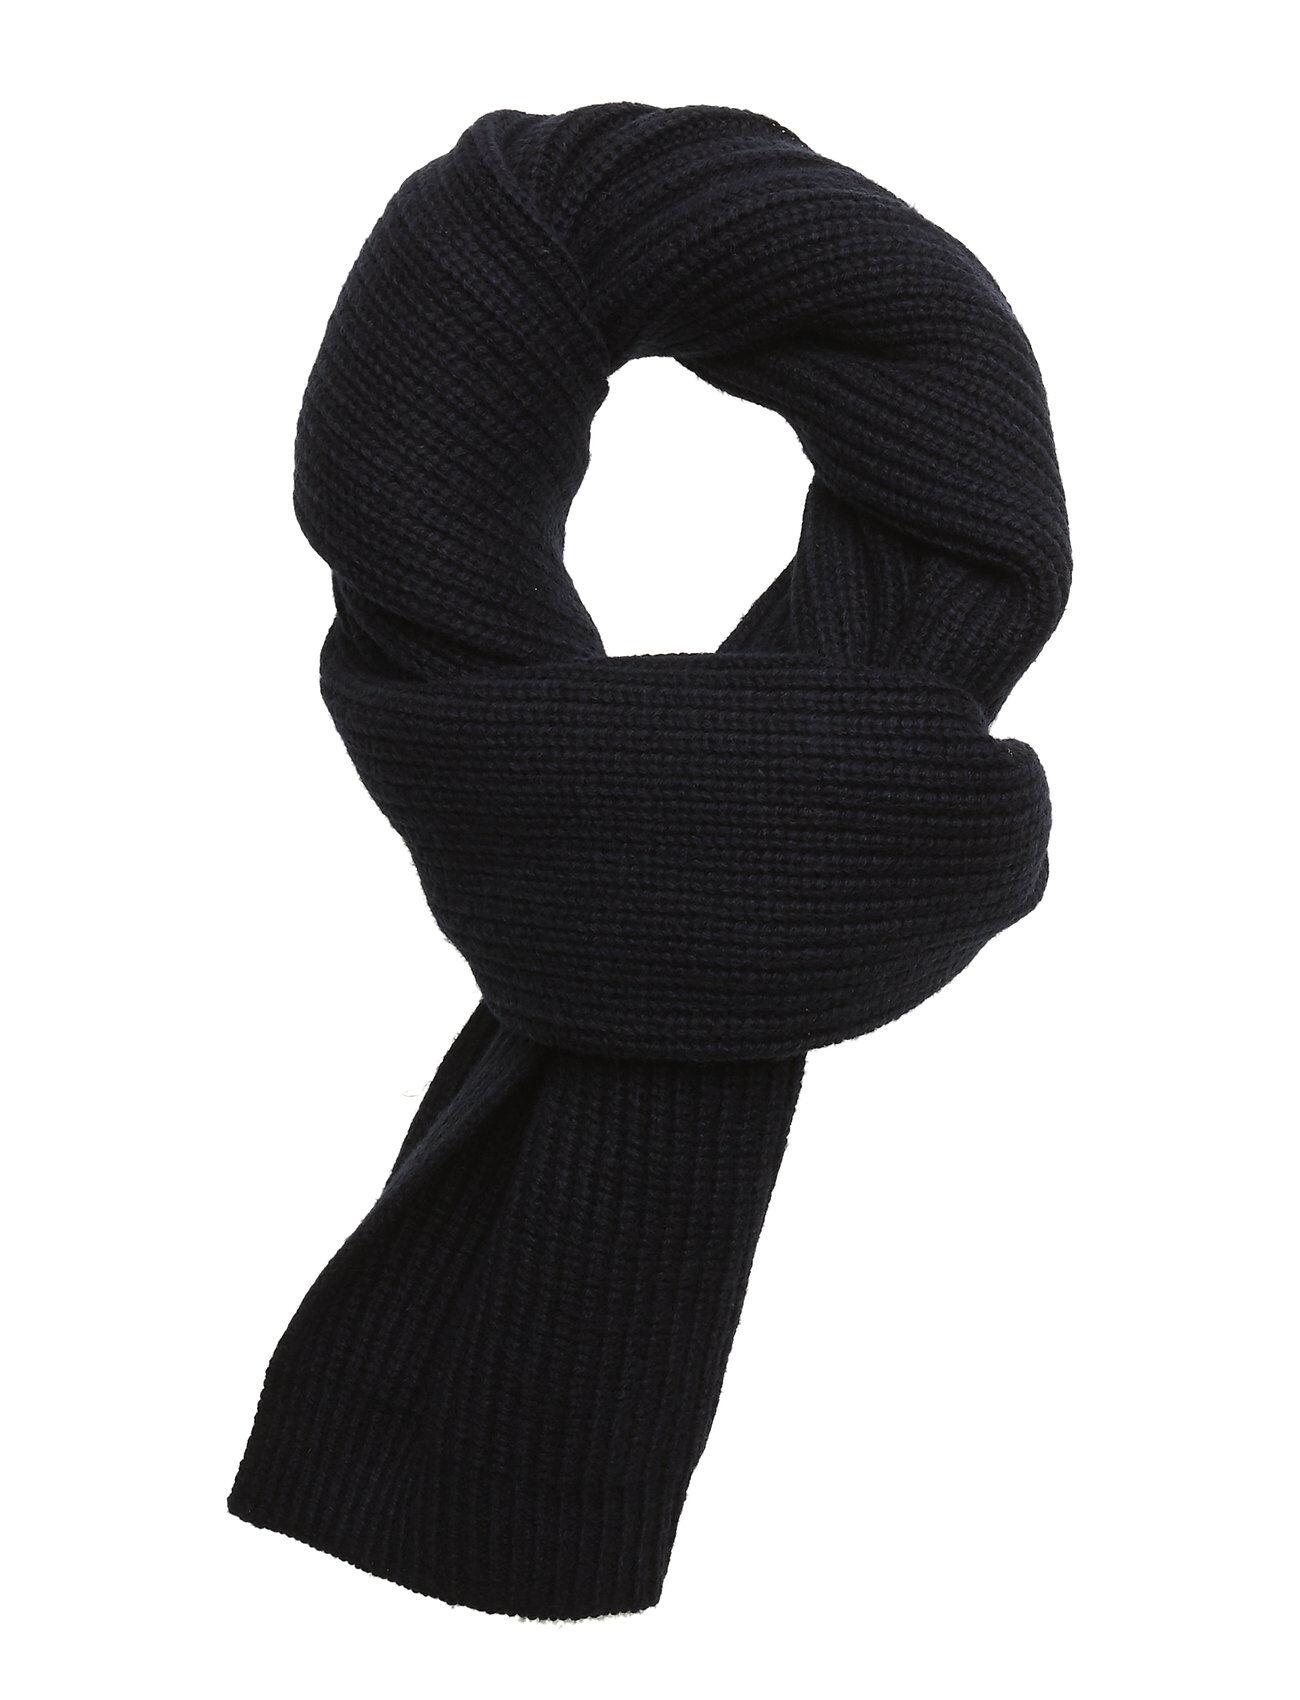 J. Lindeberg Arn Winter Knit